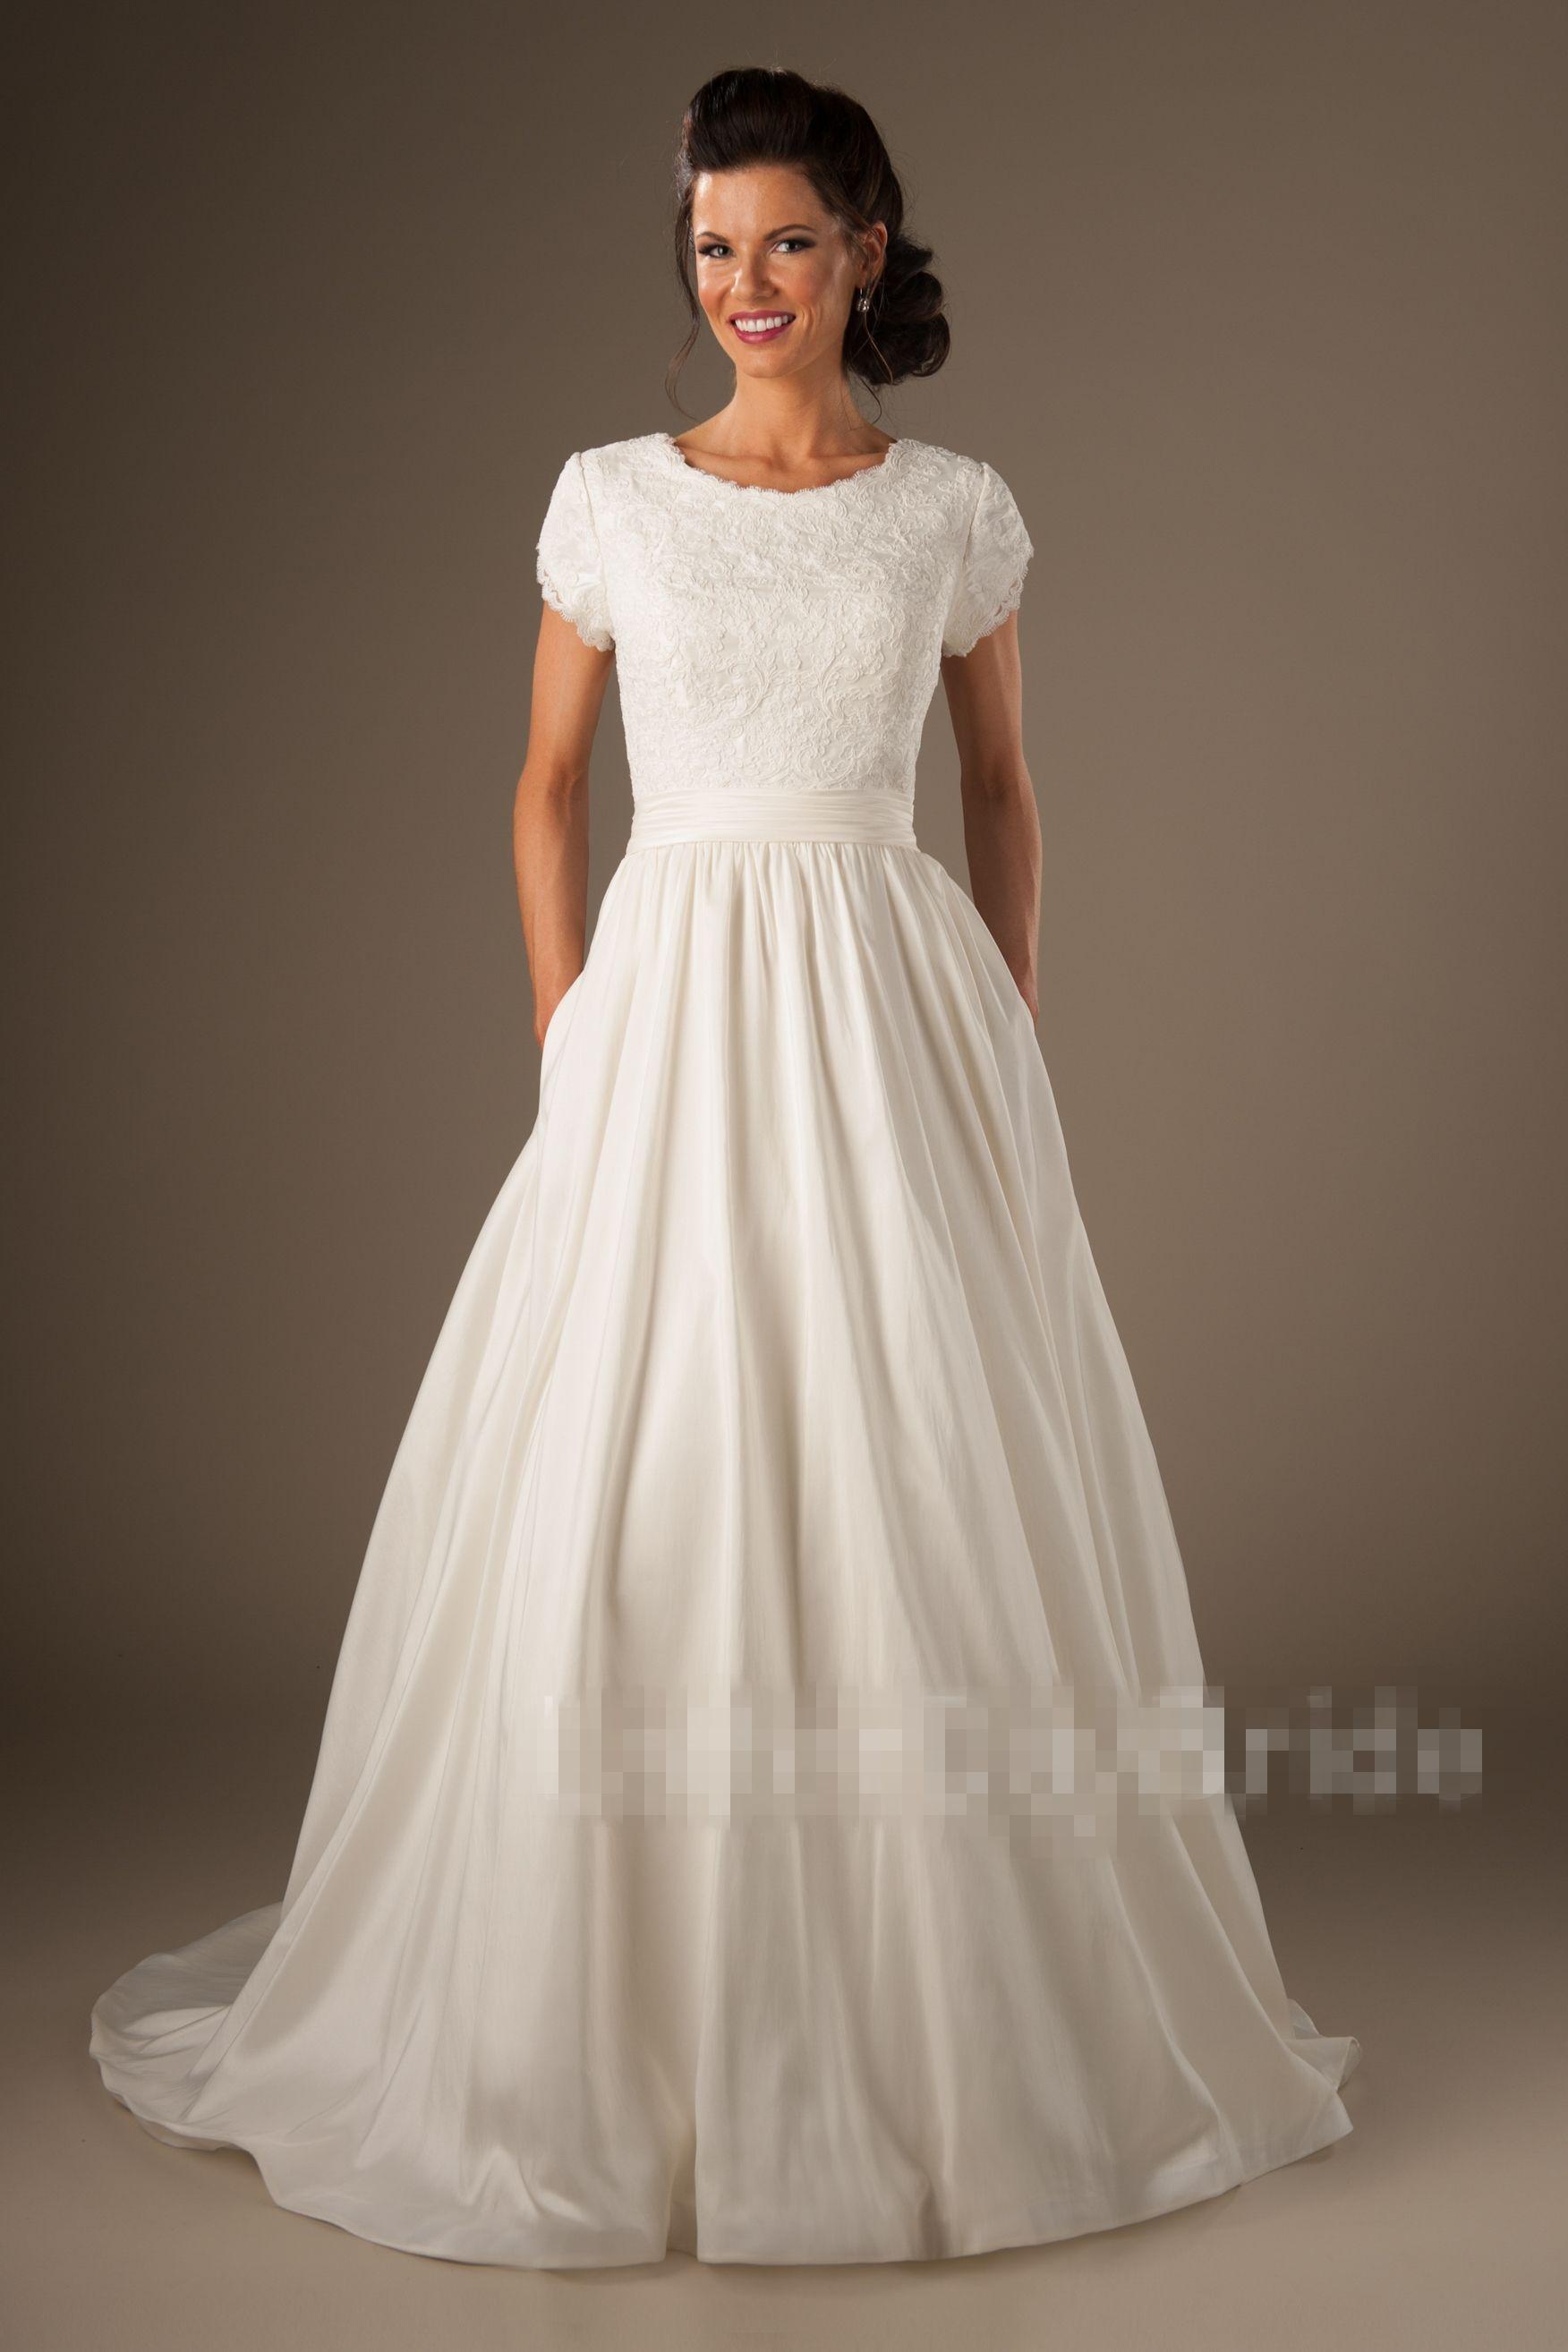 Simple Ivory Wedding Dresses